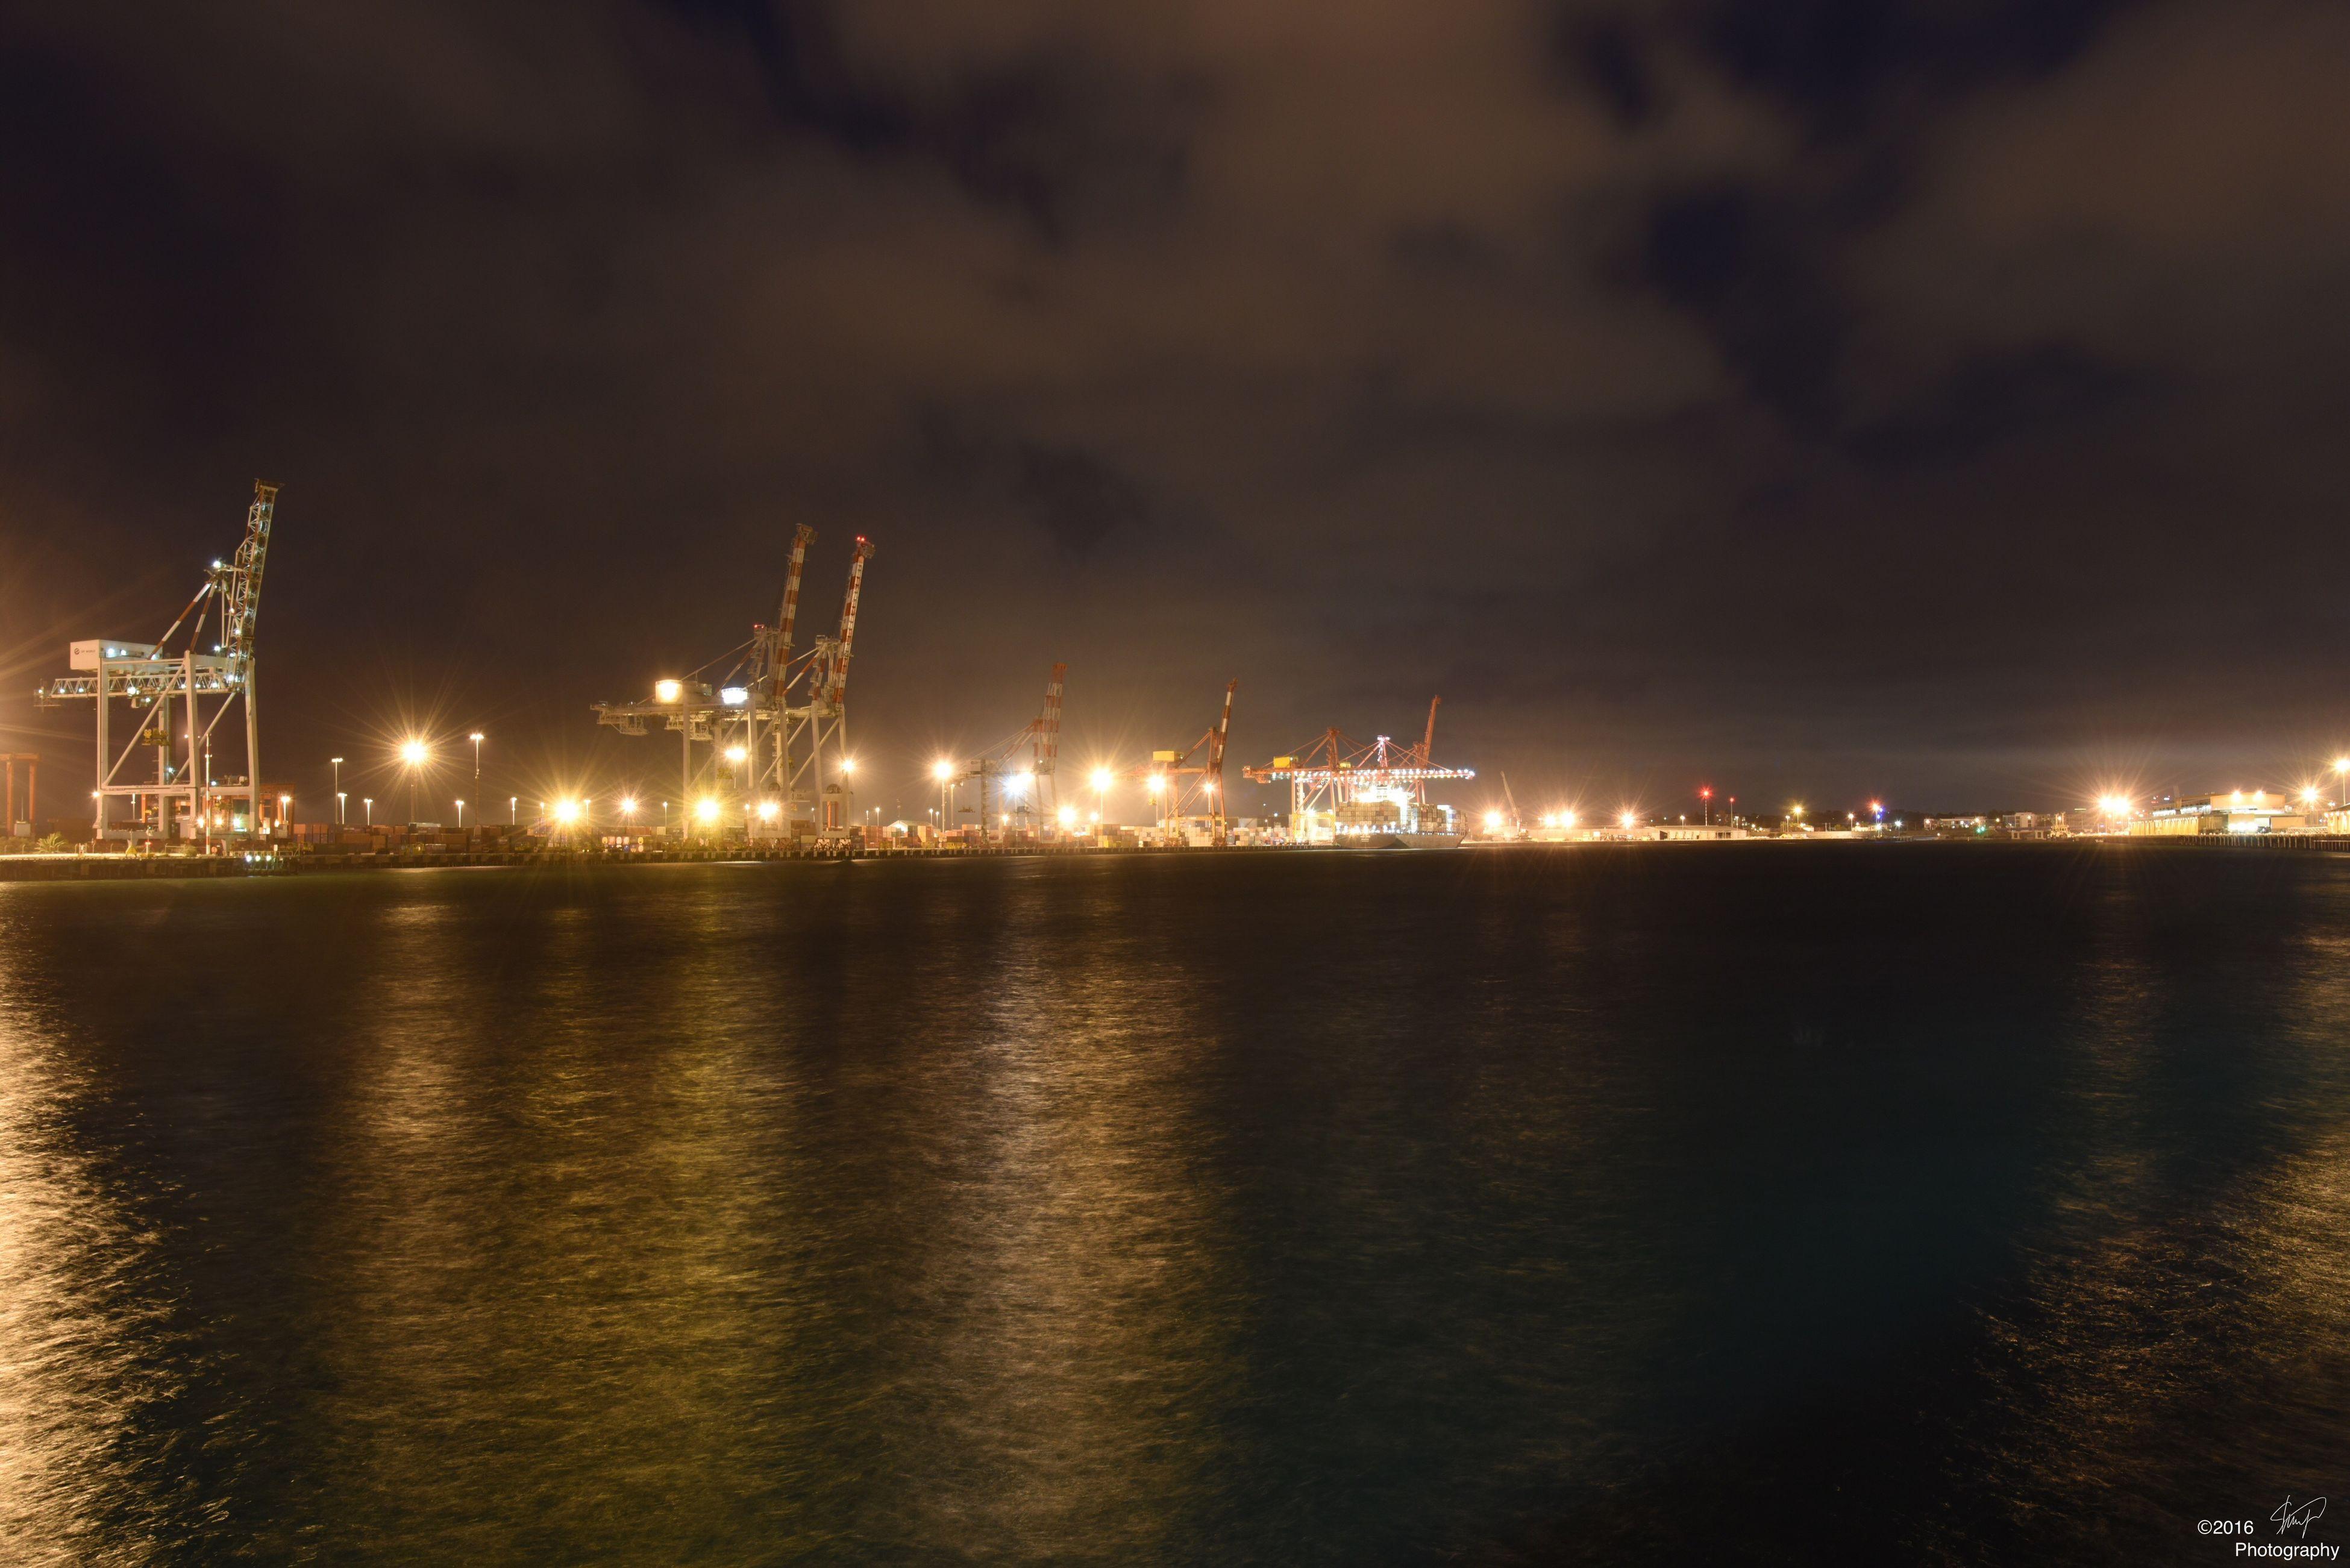 Night view at Fremantle harbor. Landscape No Filter DSLR Nikon Waterfront Outdoors Nightphotography Long Exposure Fremantle  Australia